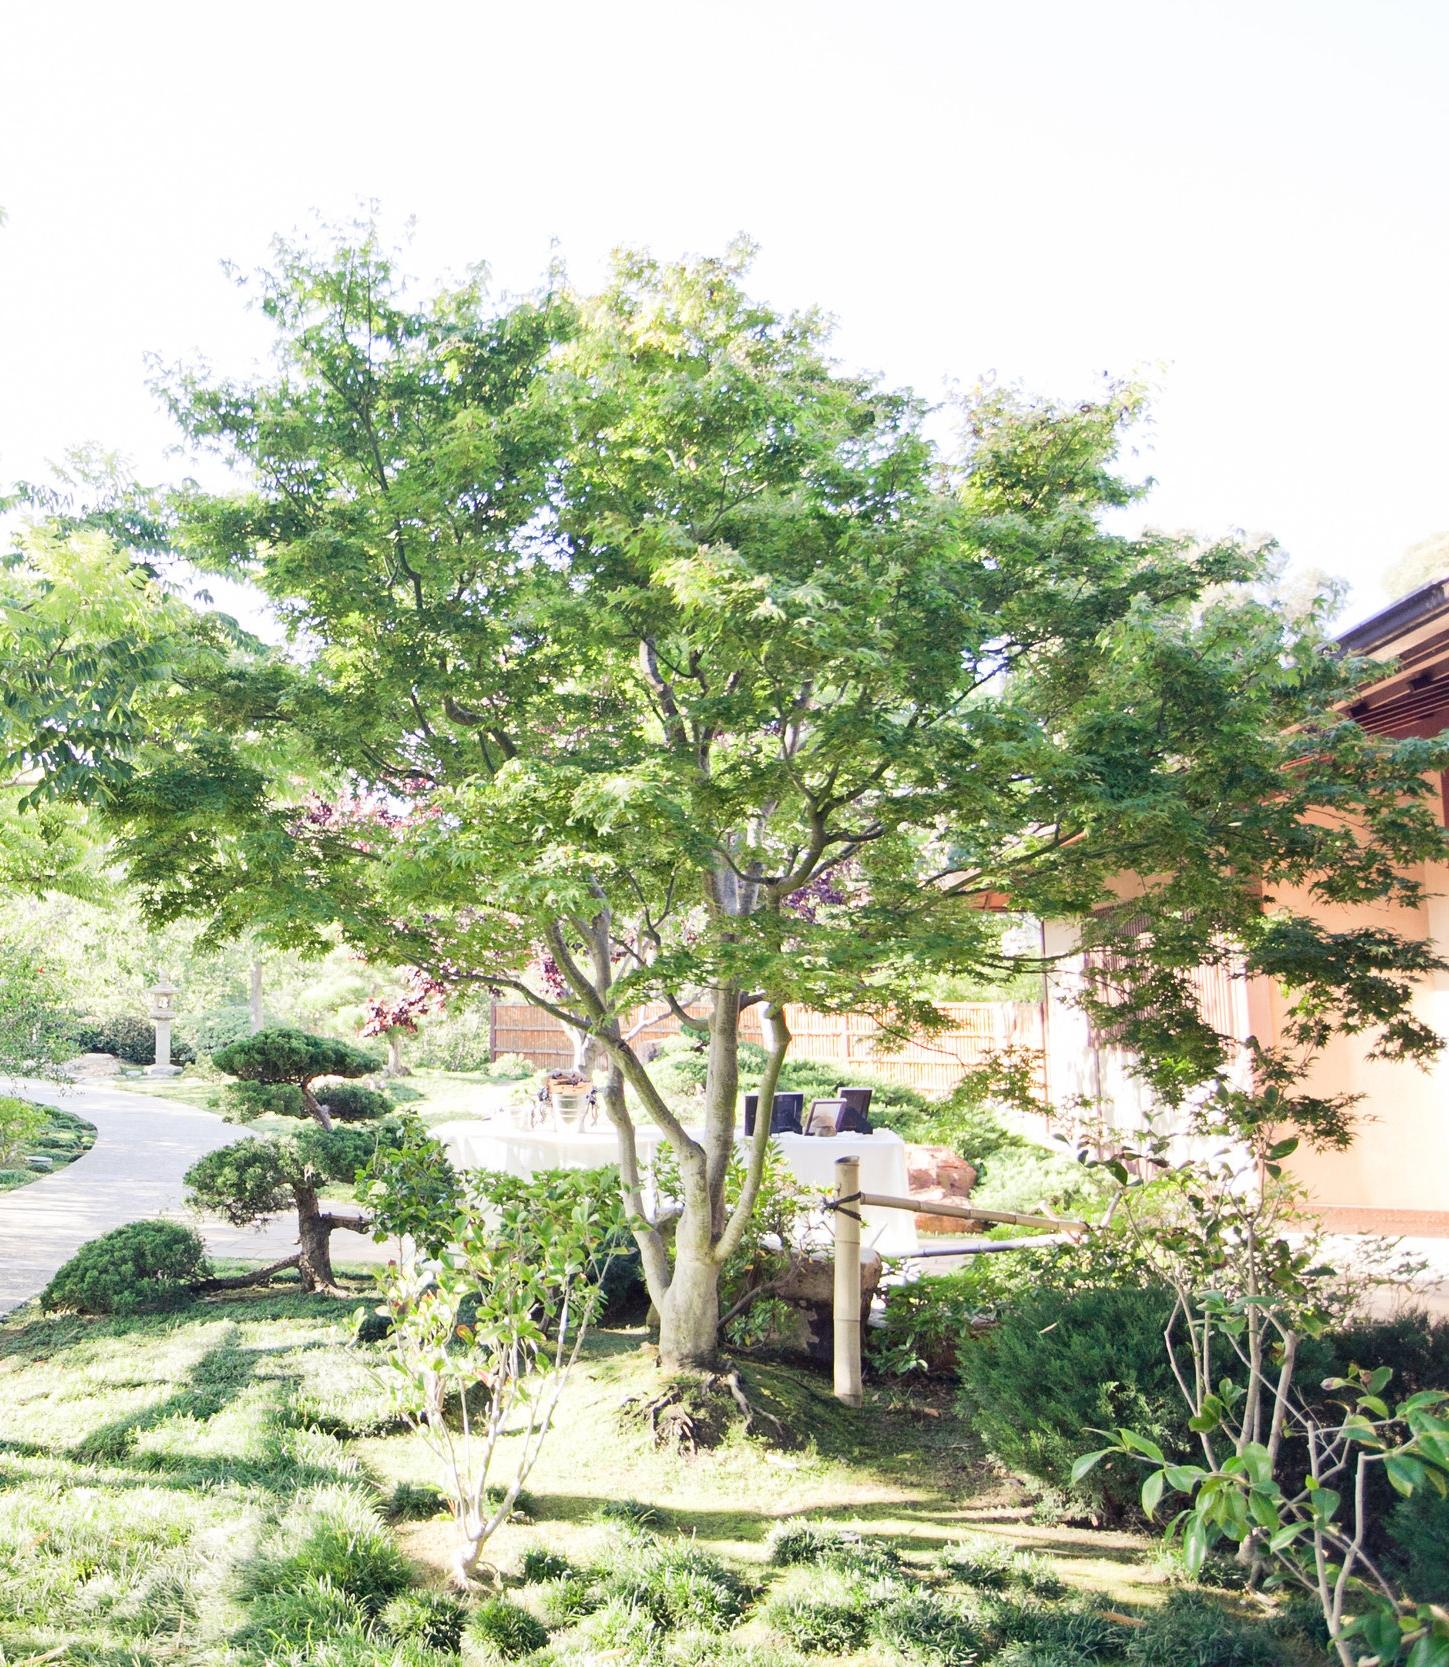 photo credit: tangerin tree photography